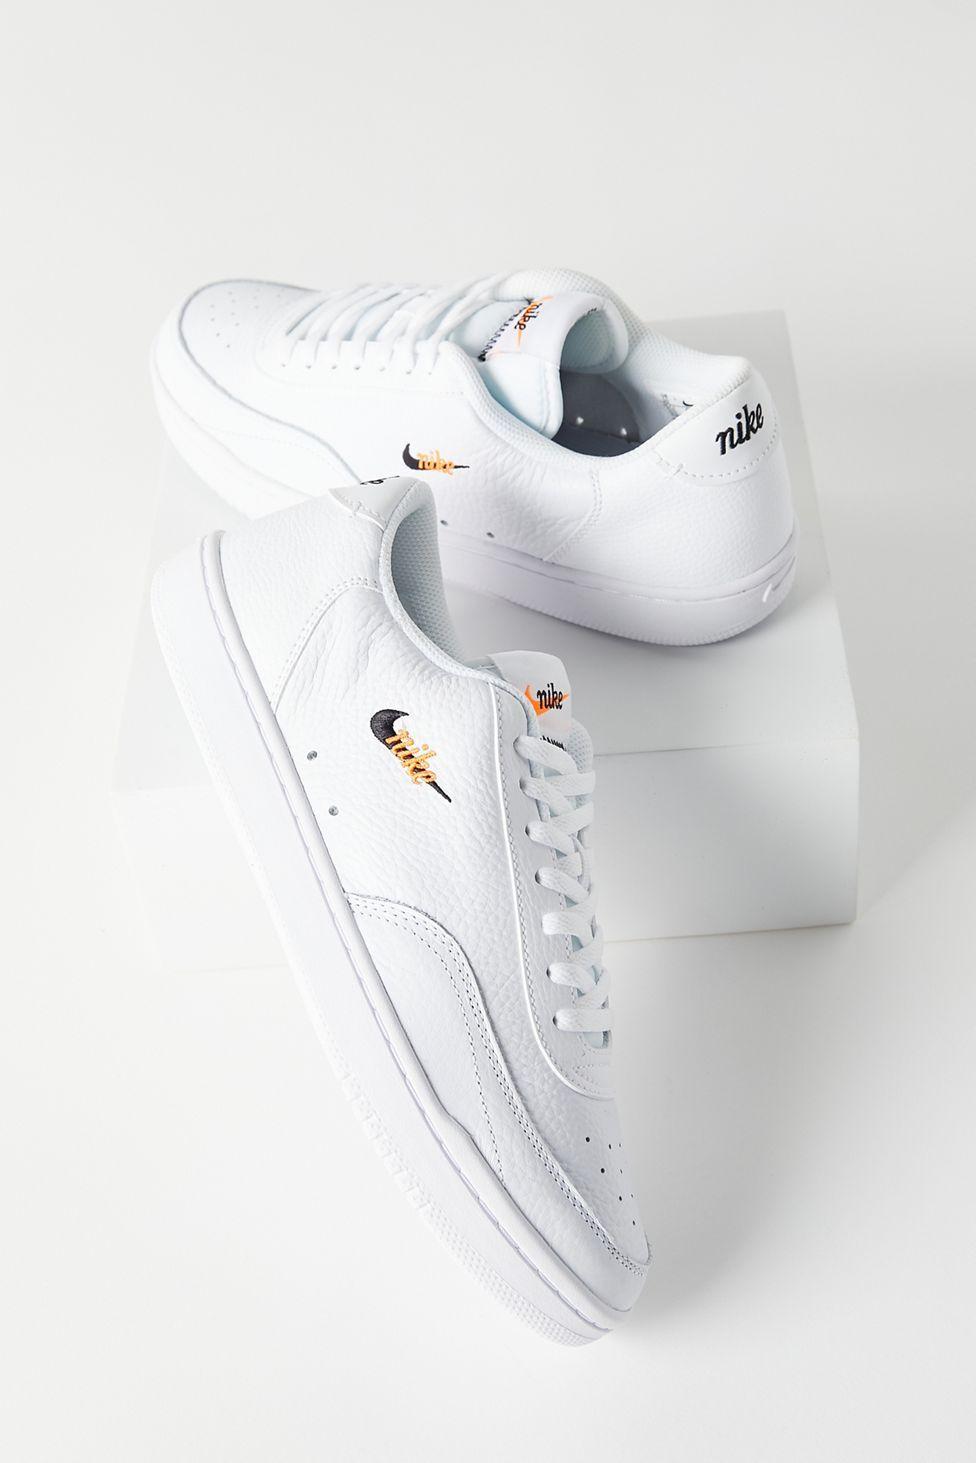 Sangriento No puedo leer ni escribir Leche  Nike Court Vintage Premium Sneaker | Urban Outfitters | Sneakers, Cute nike  shoes, Nike sneakers women